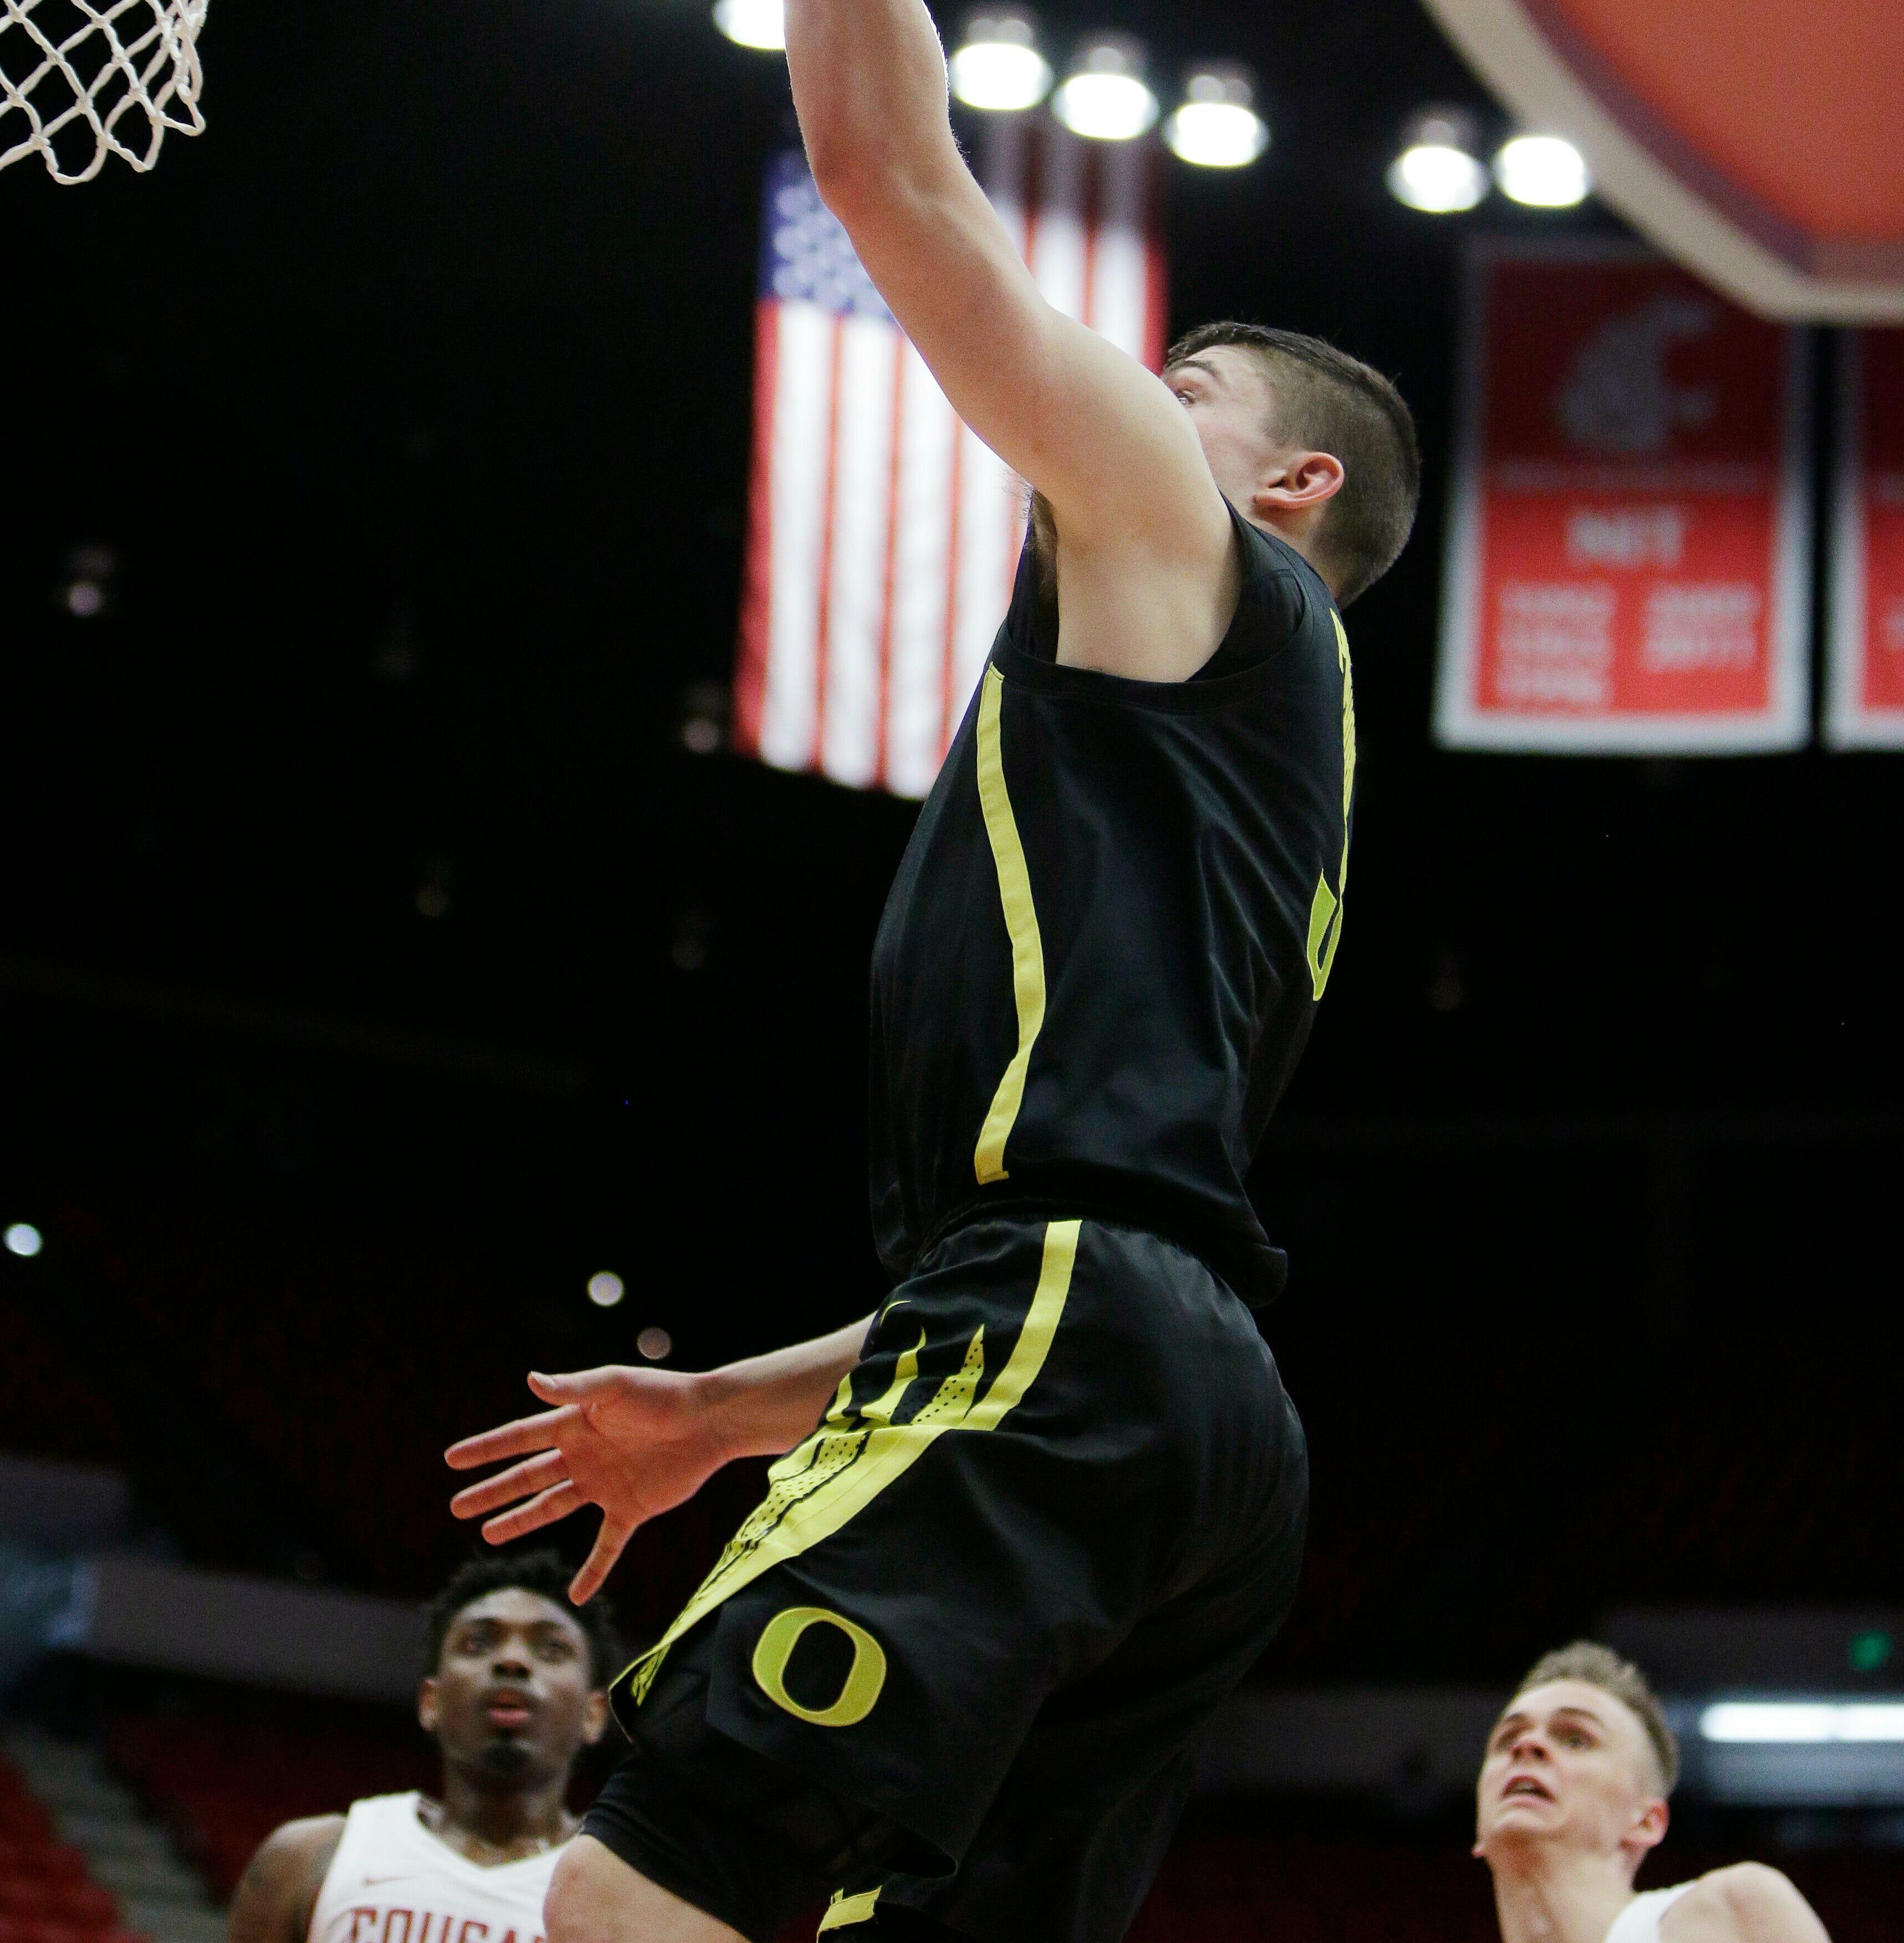 Ducks basketball: Oregon tops Washington State 72-61